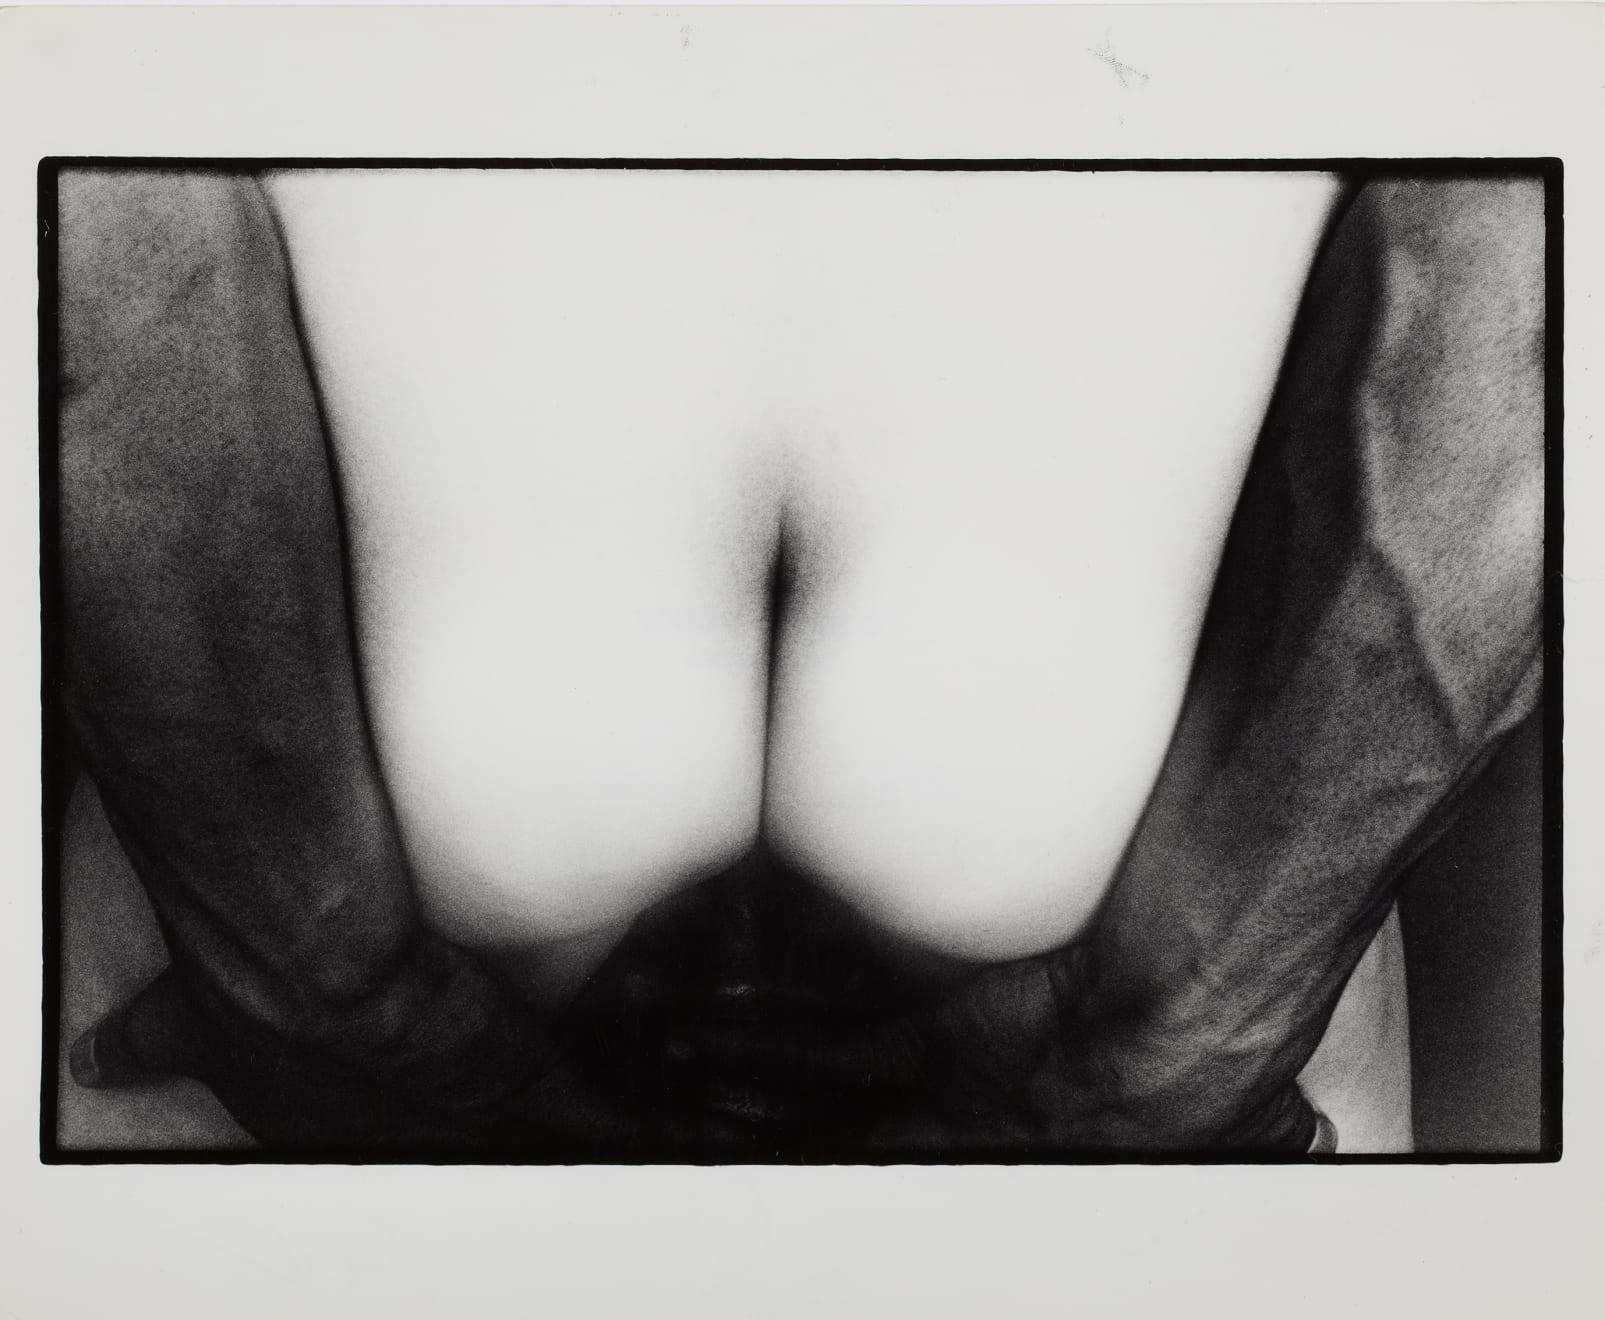 Eikoh Hosoe, 'Embrace' #49, 1970